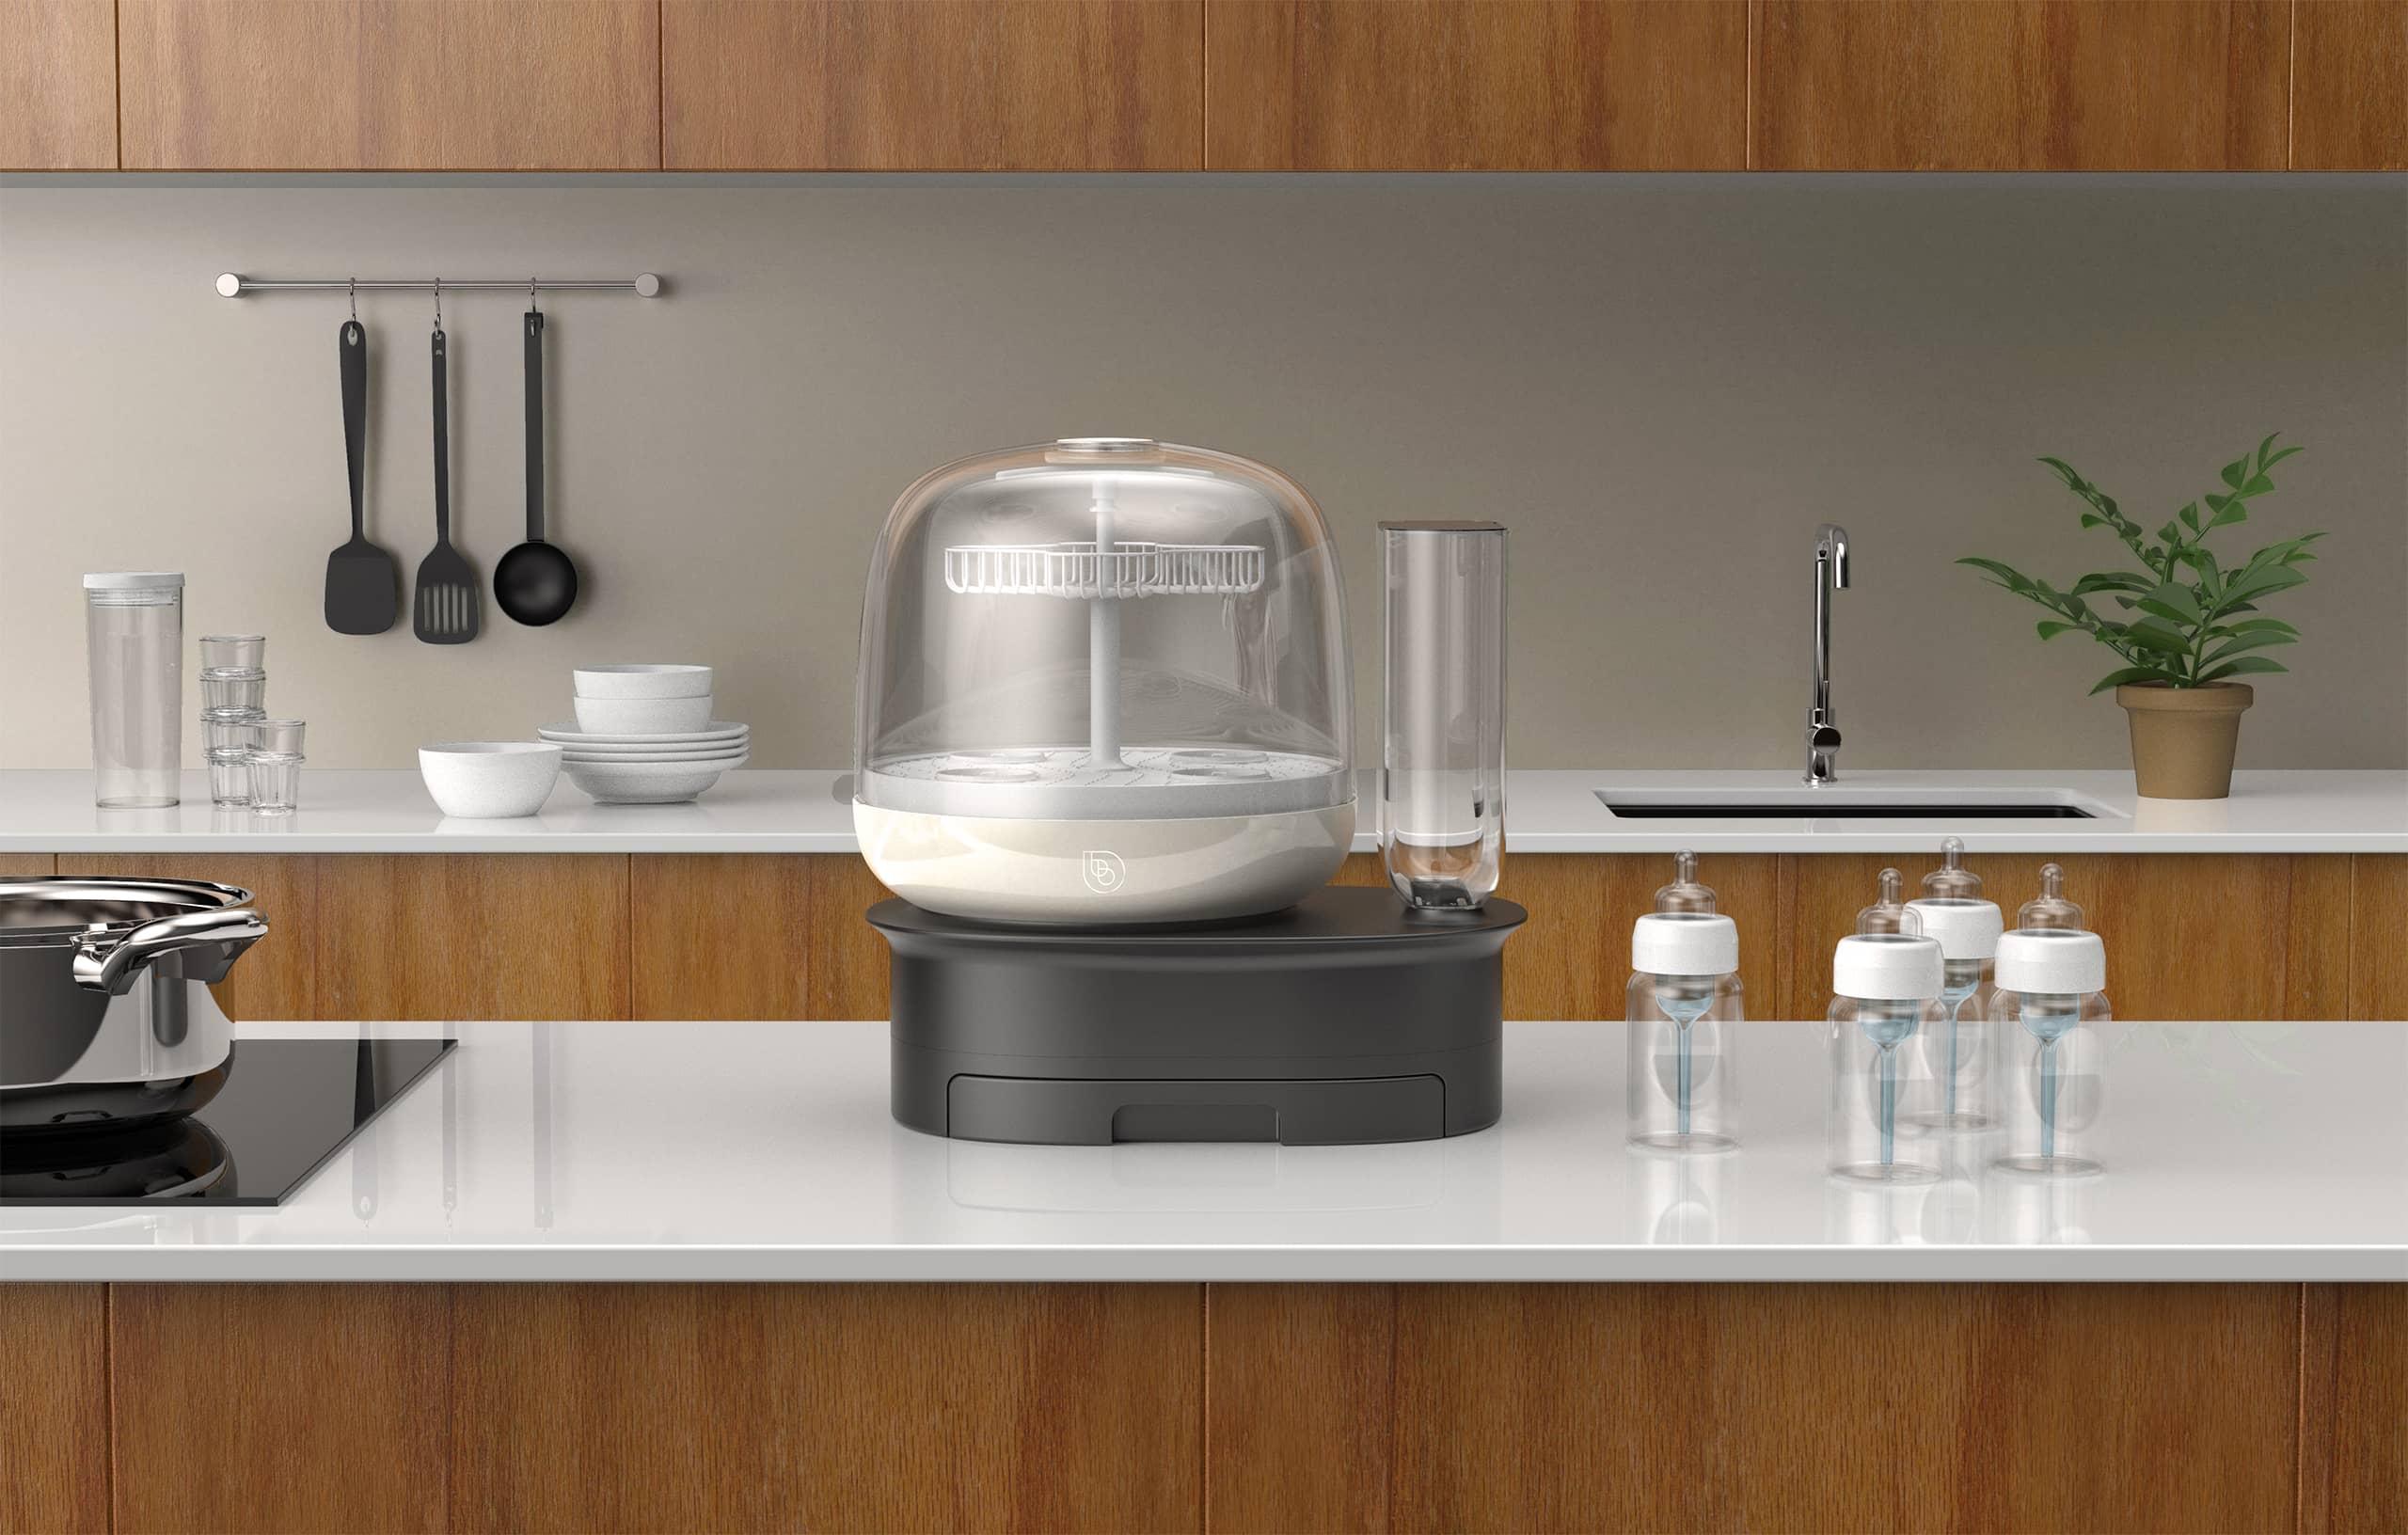 STUCK_BottleBath_Kitchen_Environment